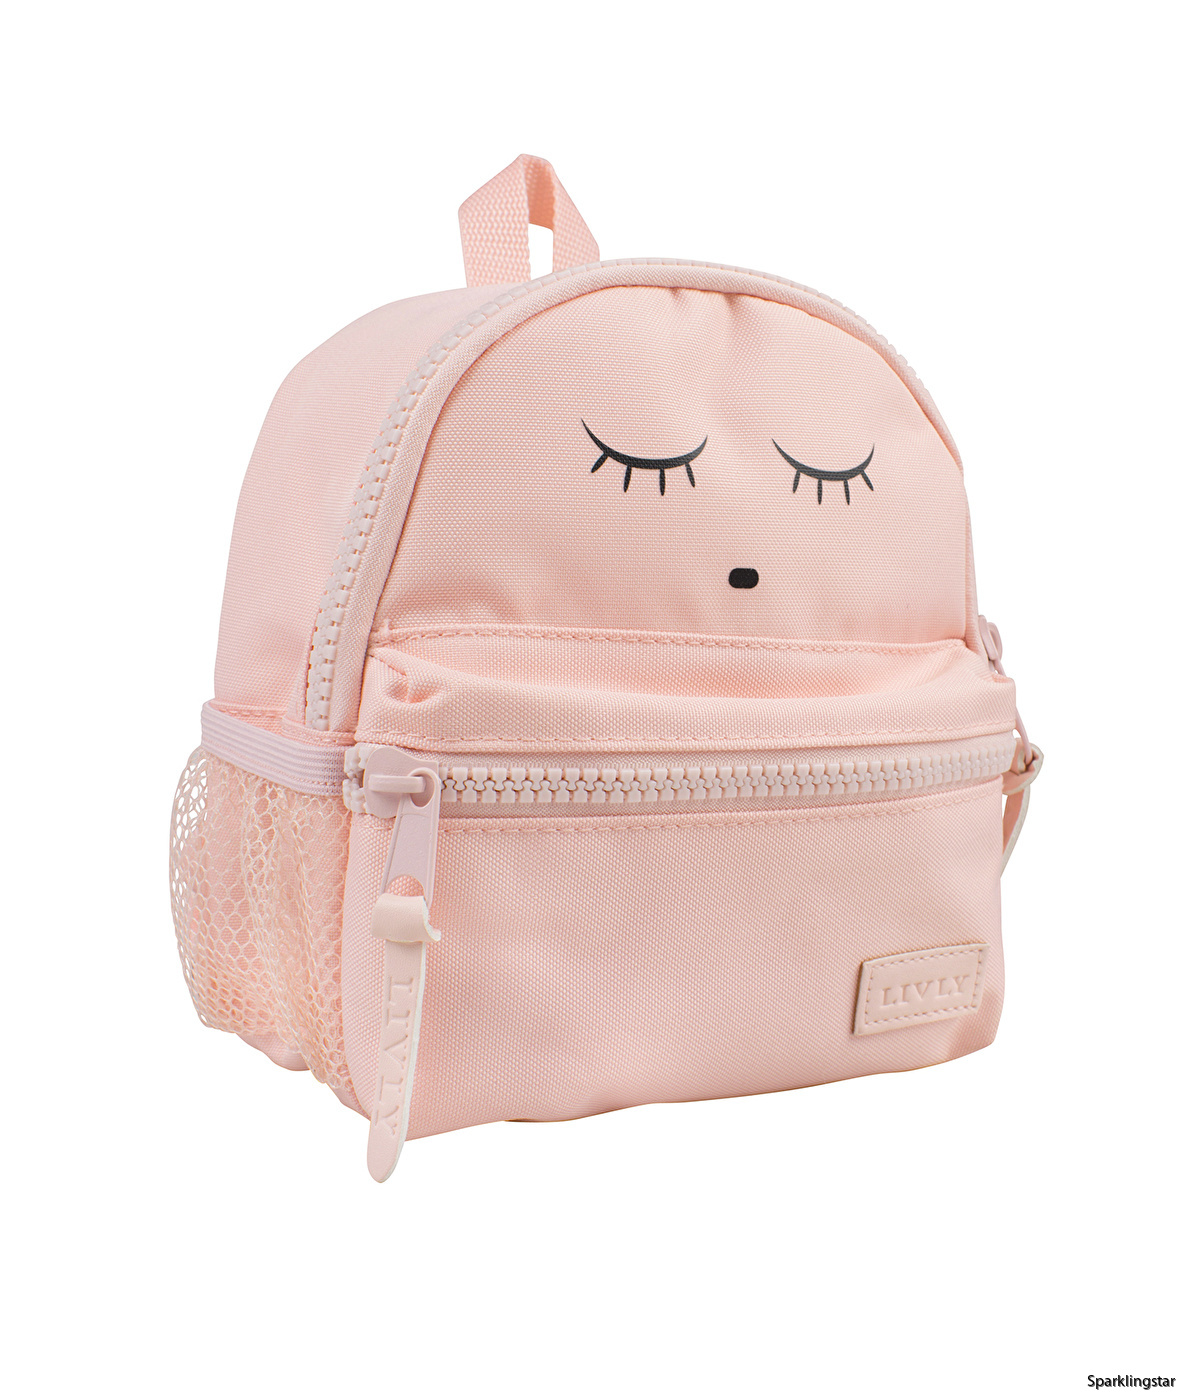 Livly Backpack Sleeping Cutie ( Mini )